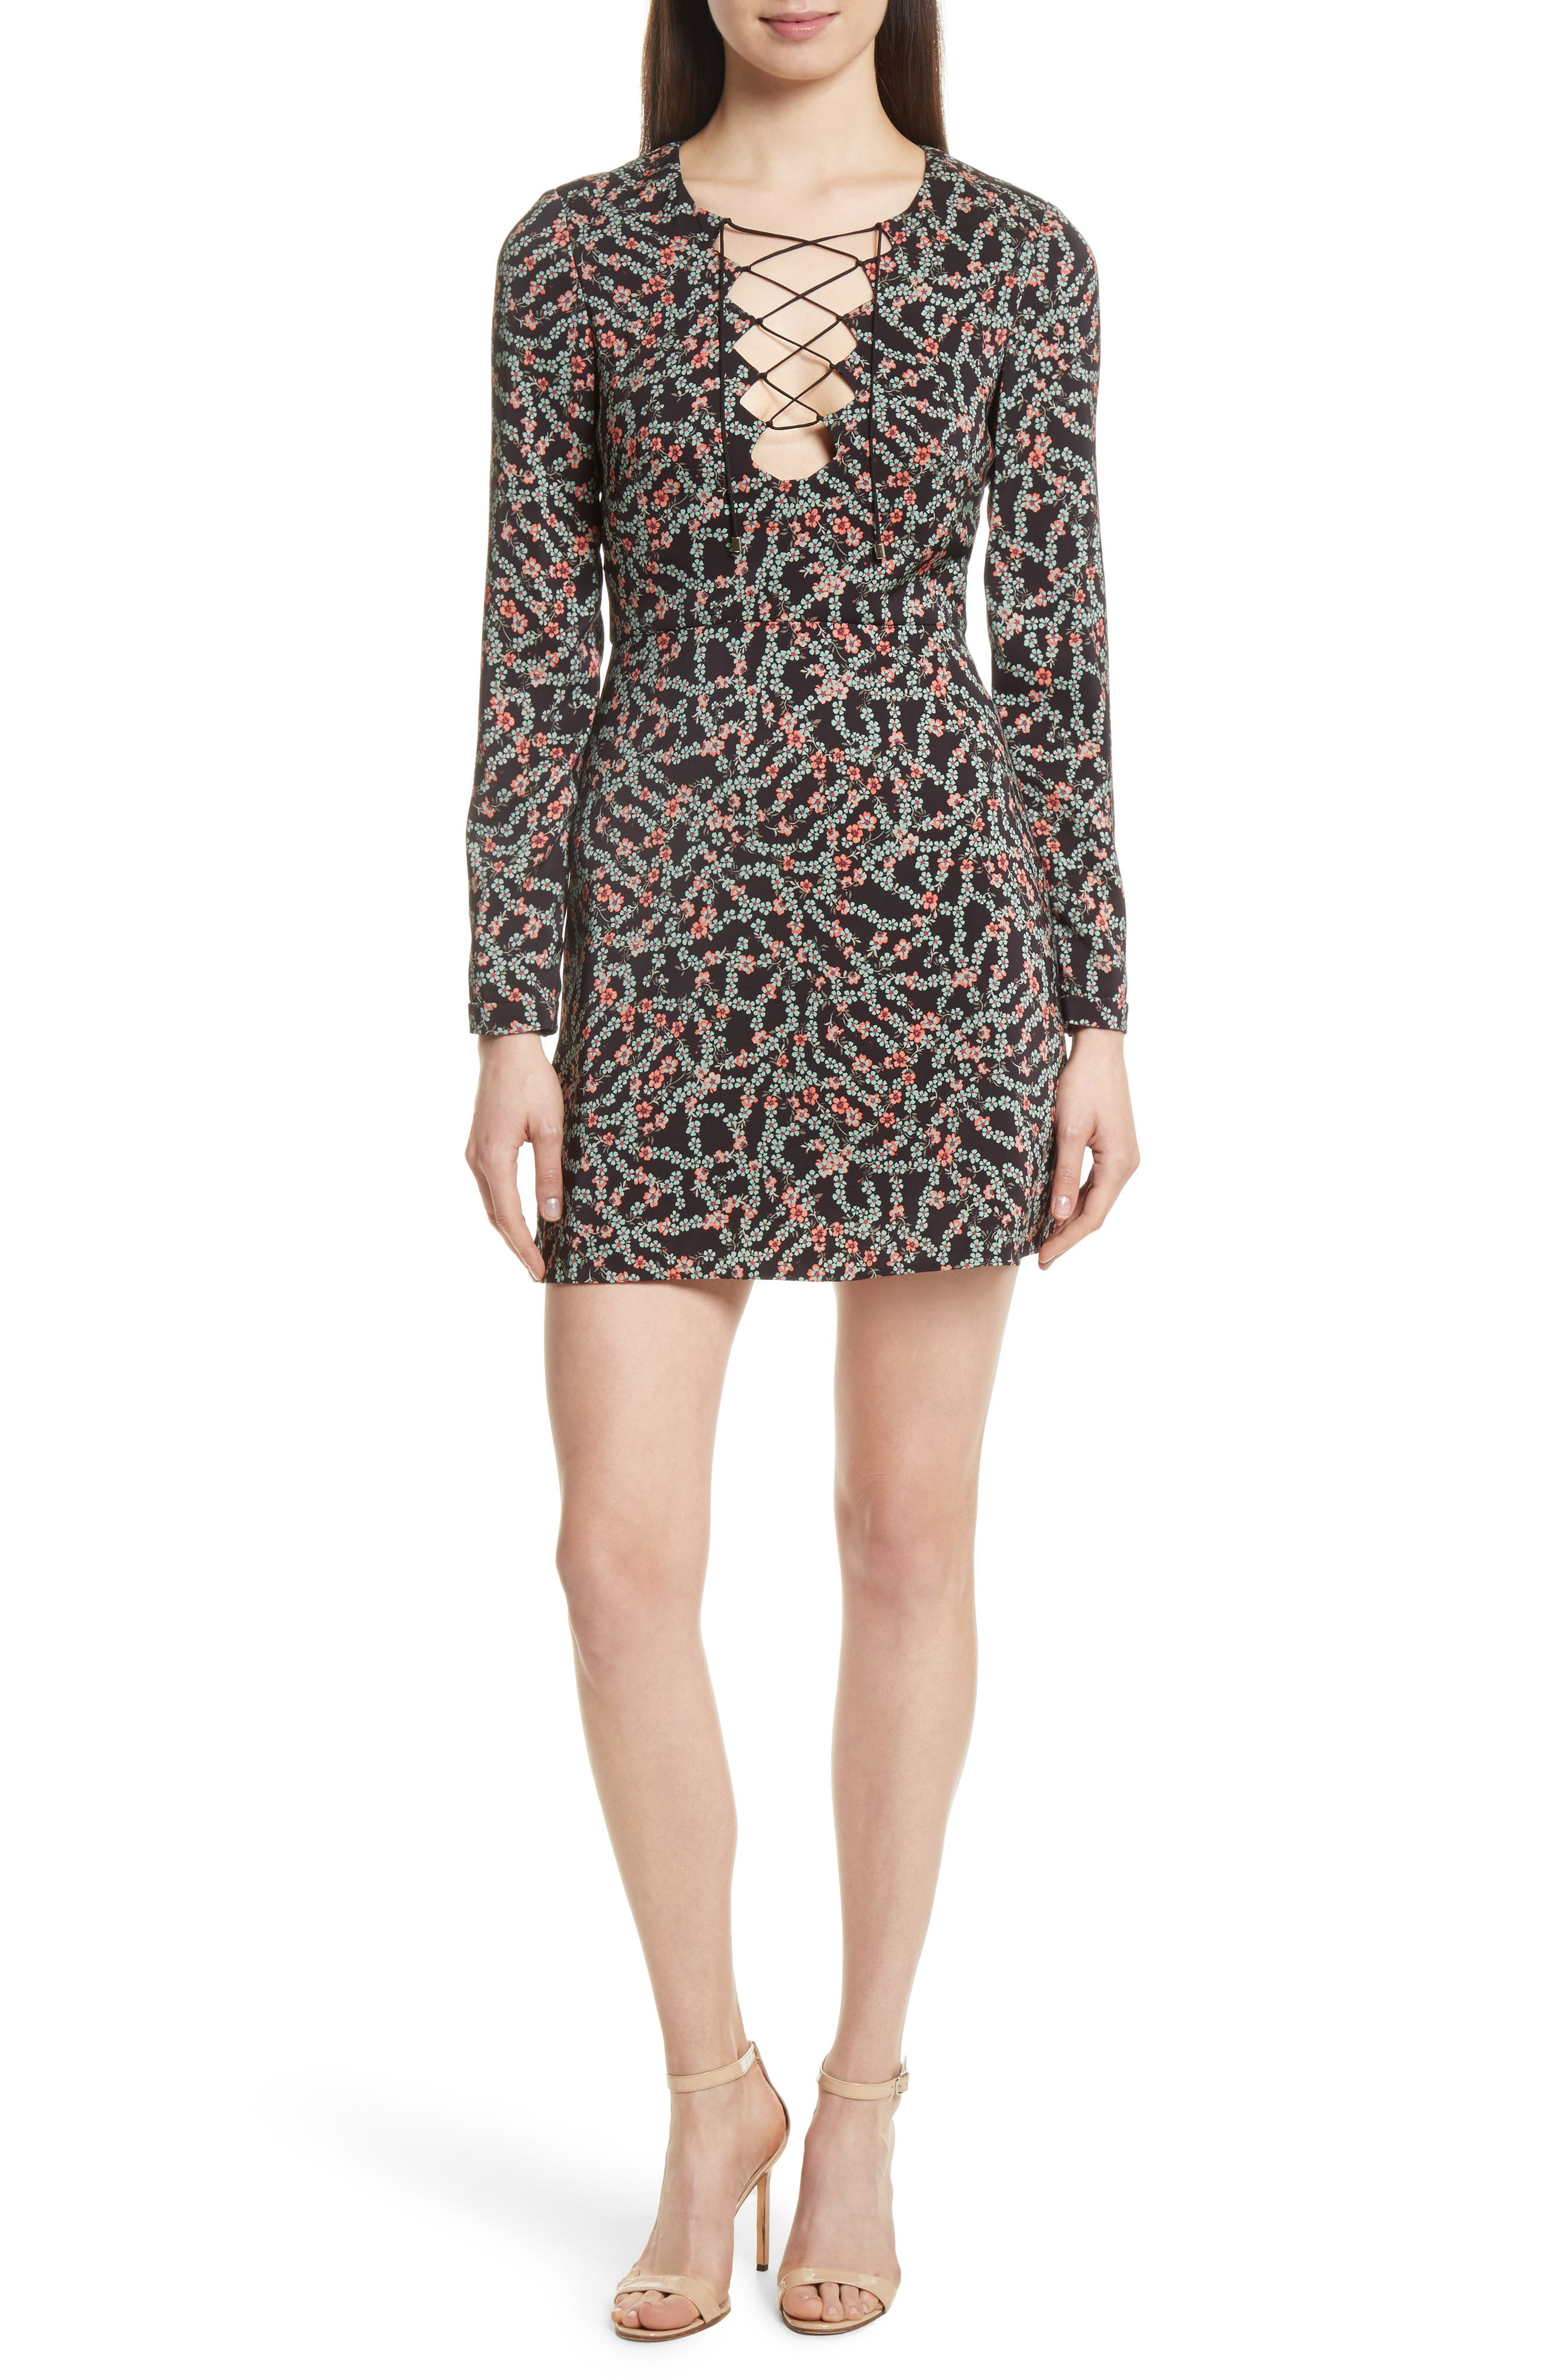 Main Image - SALONI Nurul Floral Print Lace-Up Dress